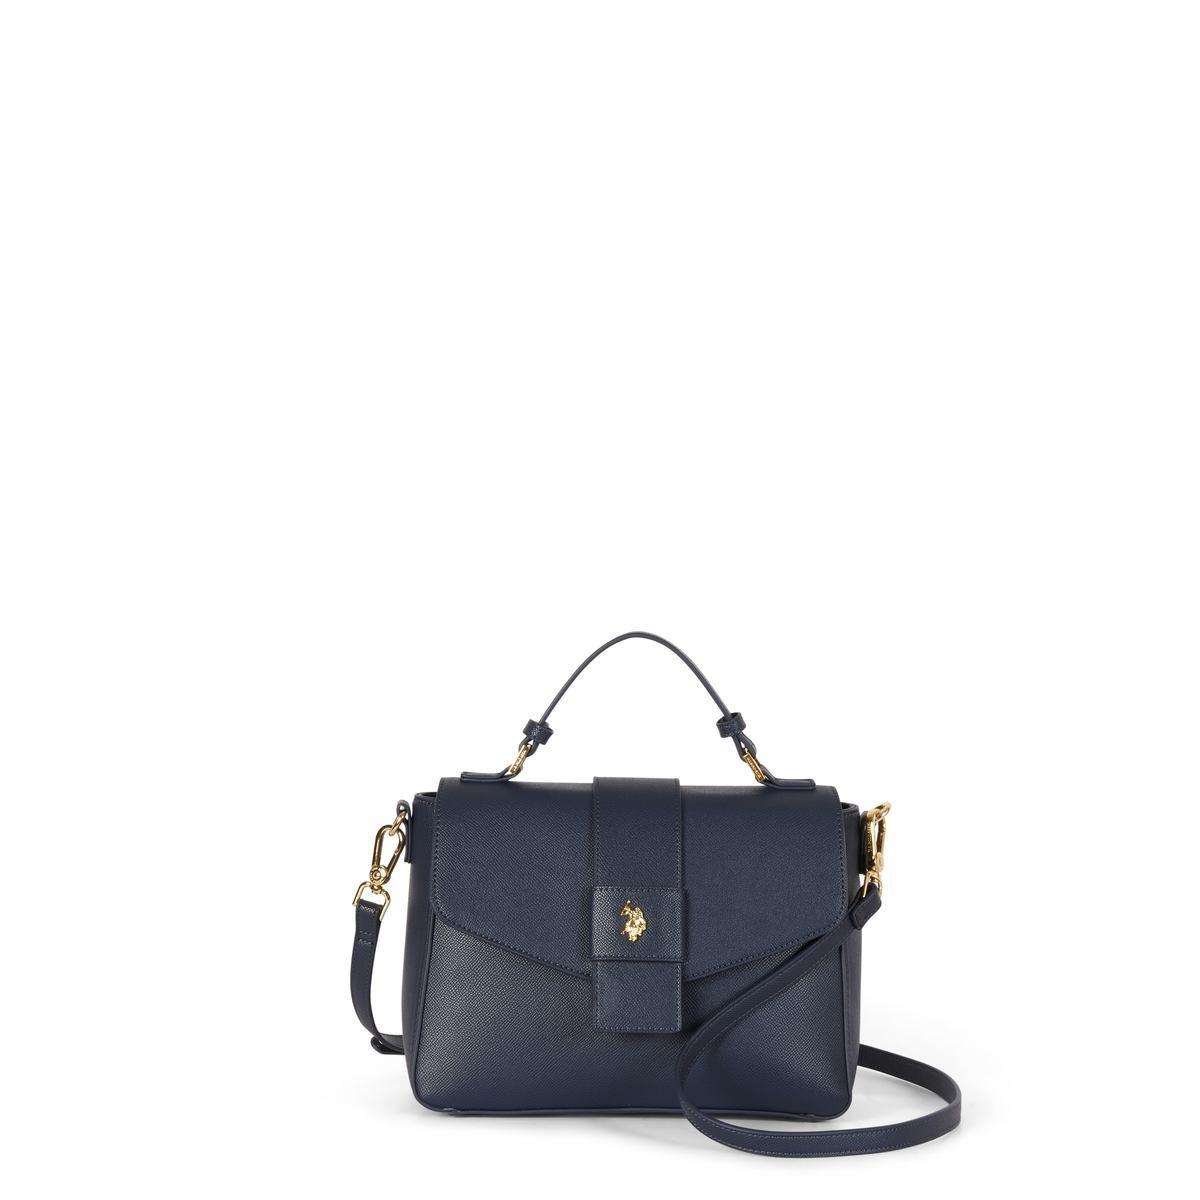 US Polo Assn. Τσάντα χειρός με χερούλι 27x11x20cm Jones Blue